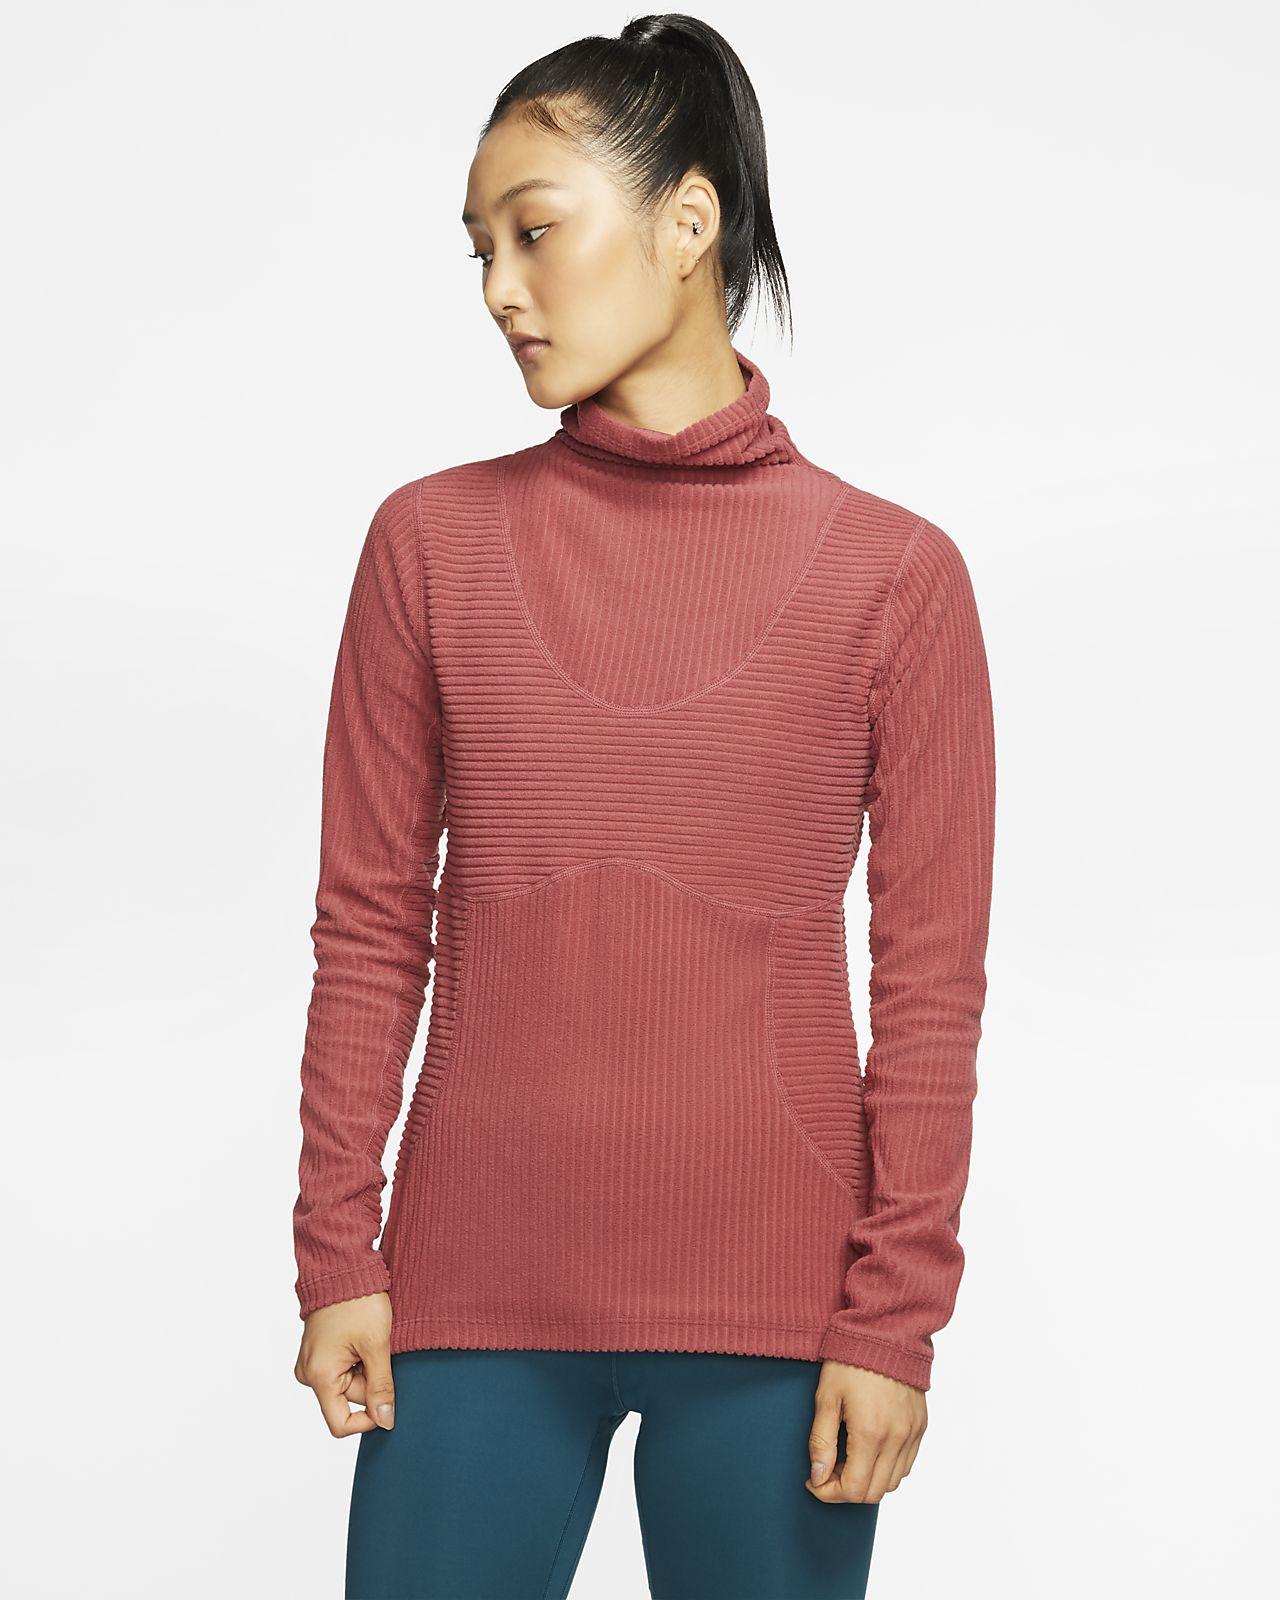 Damska koszulka welurowa Nike Pro HyperWarm